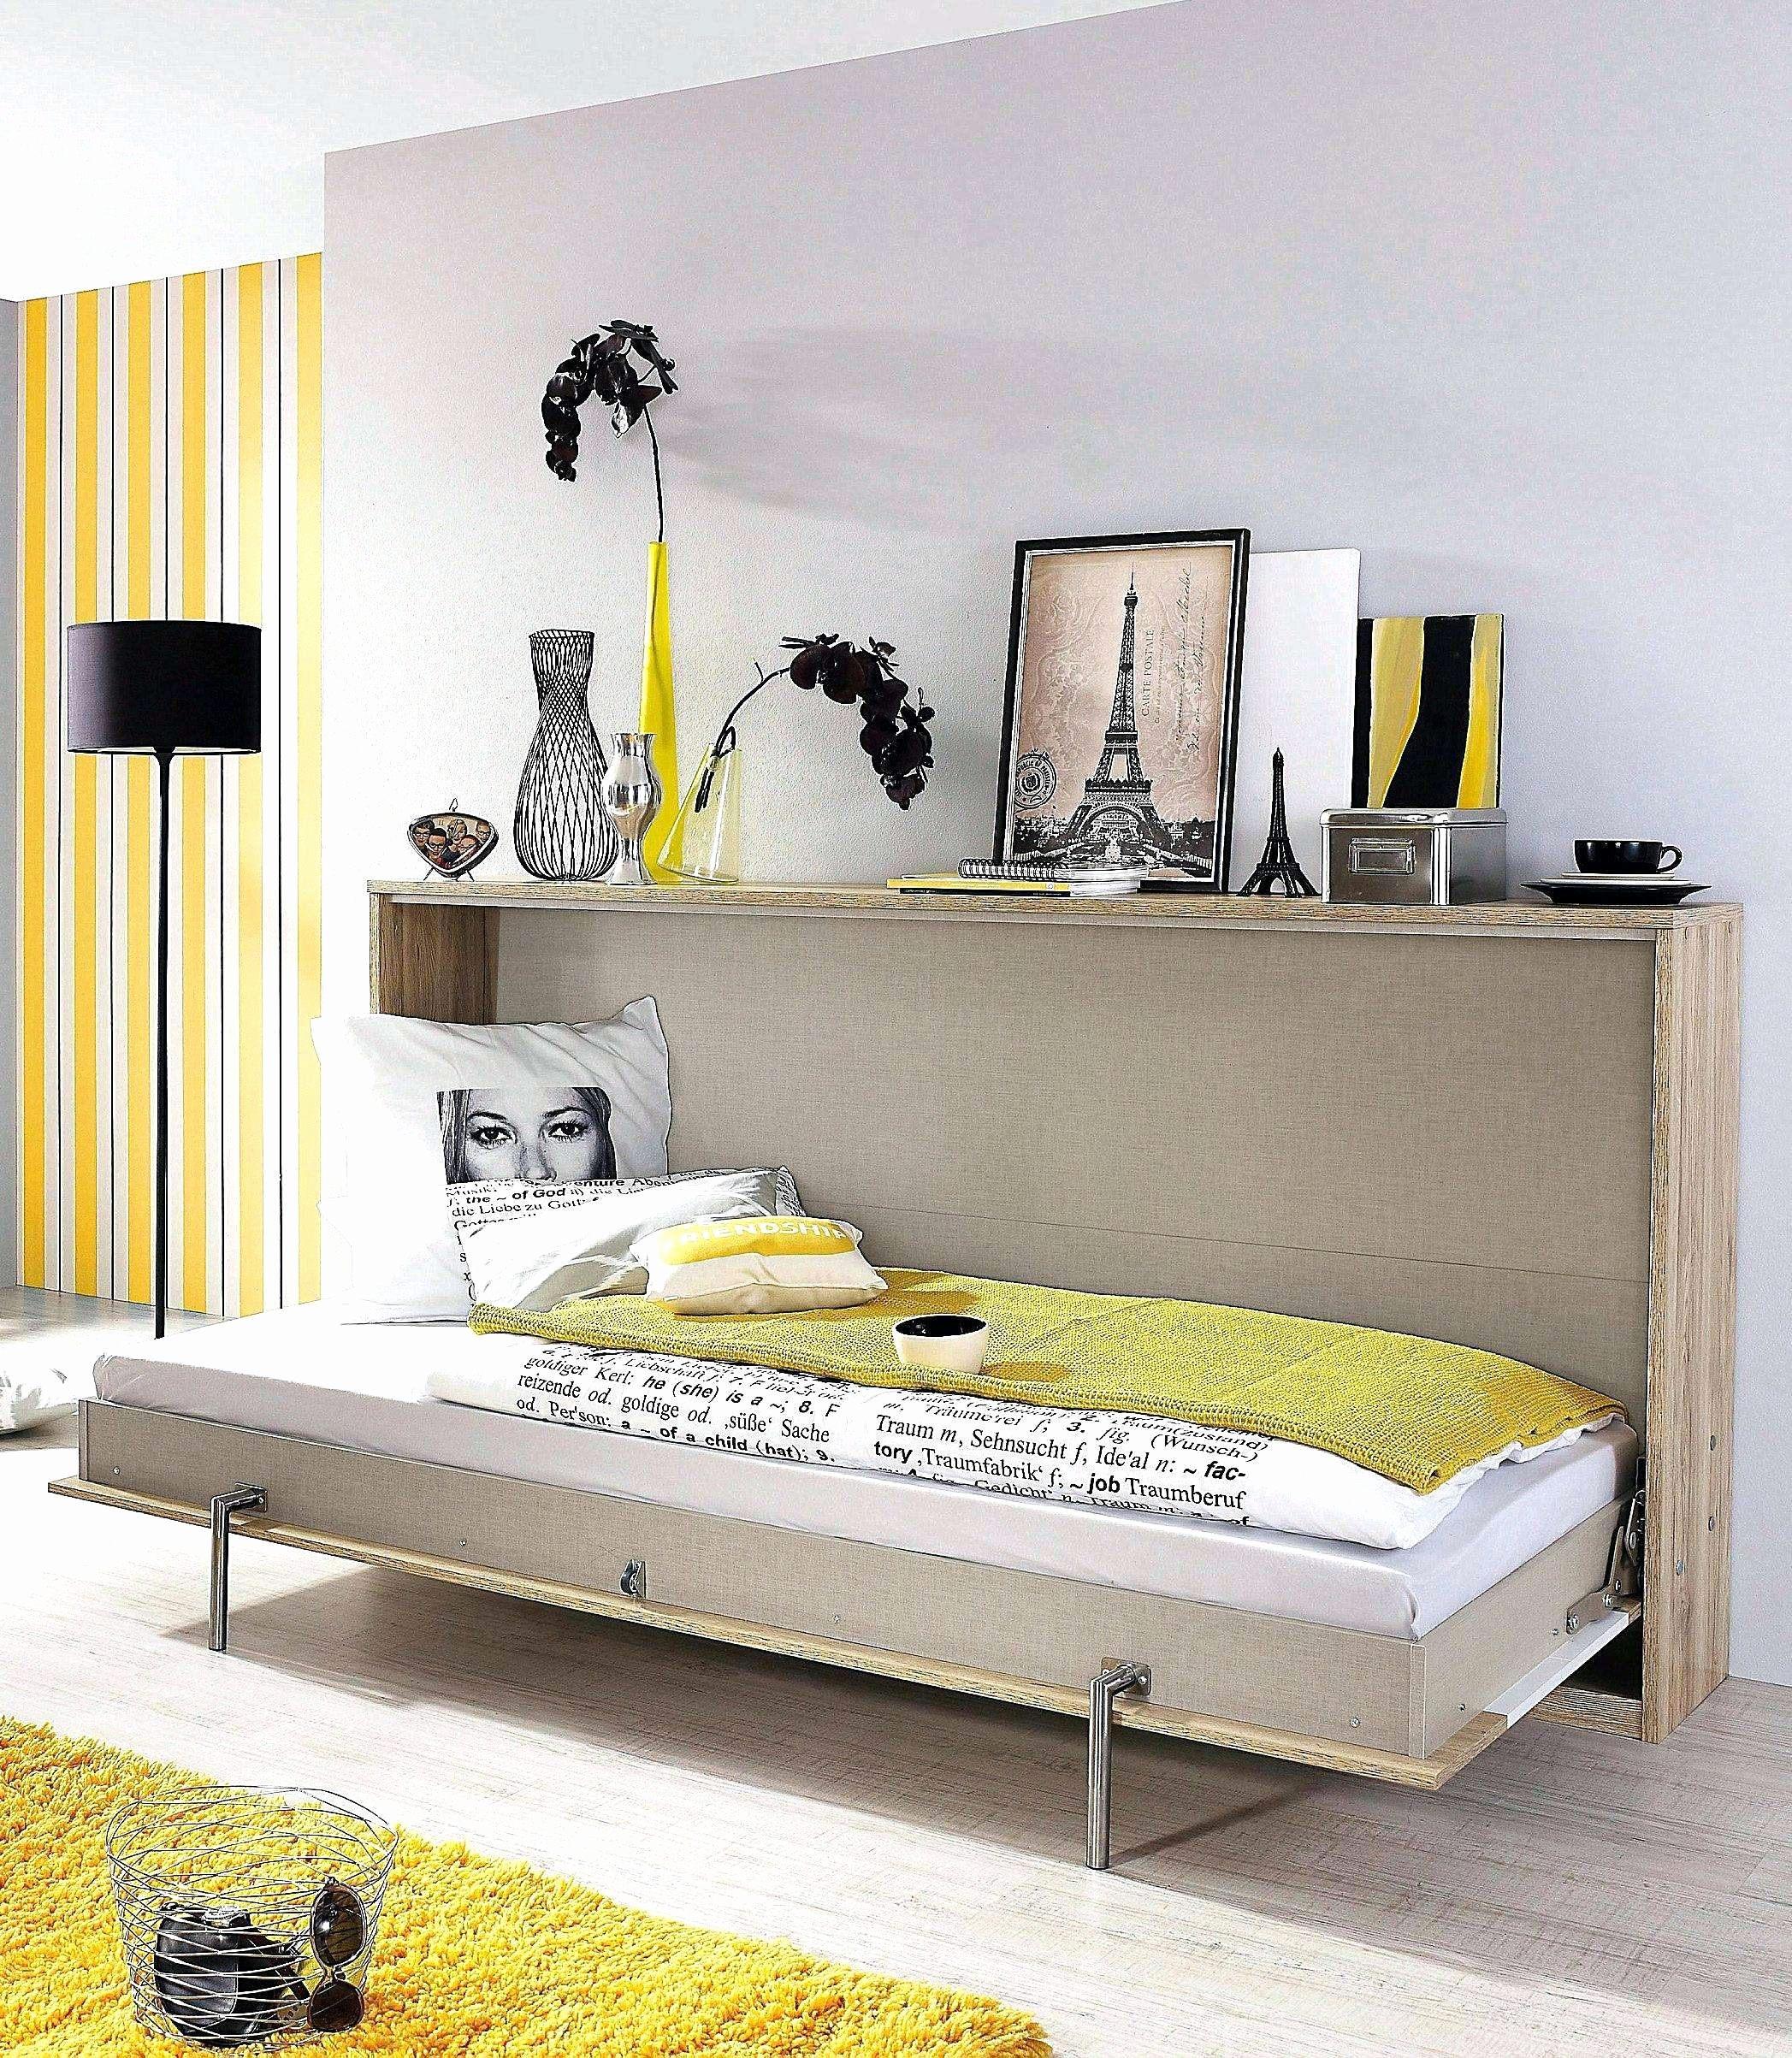 Lit Ikea 140 Inspiré Lit Escamotable Avec Canape Integre Ikea Ikea Lit Mandal 140